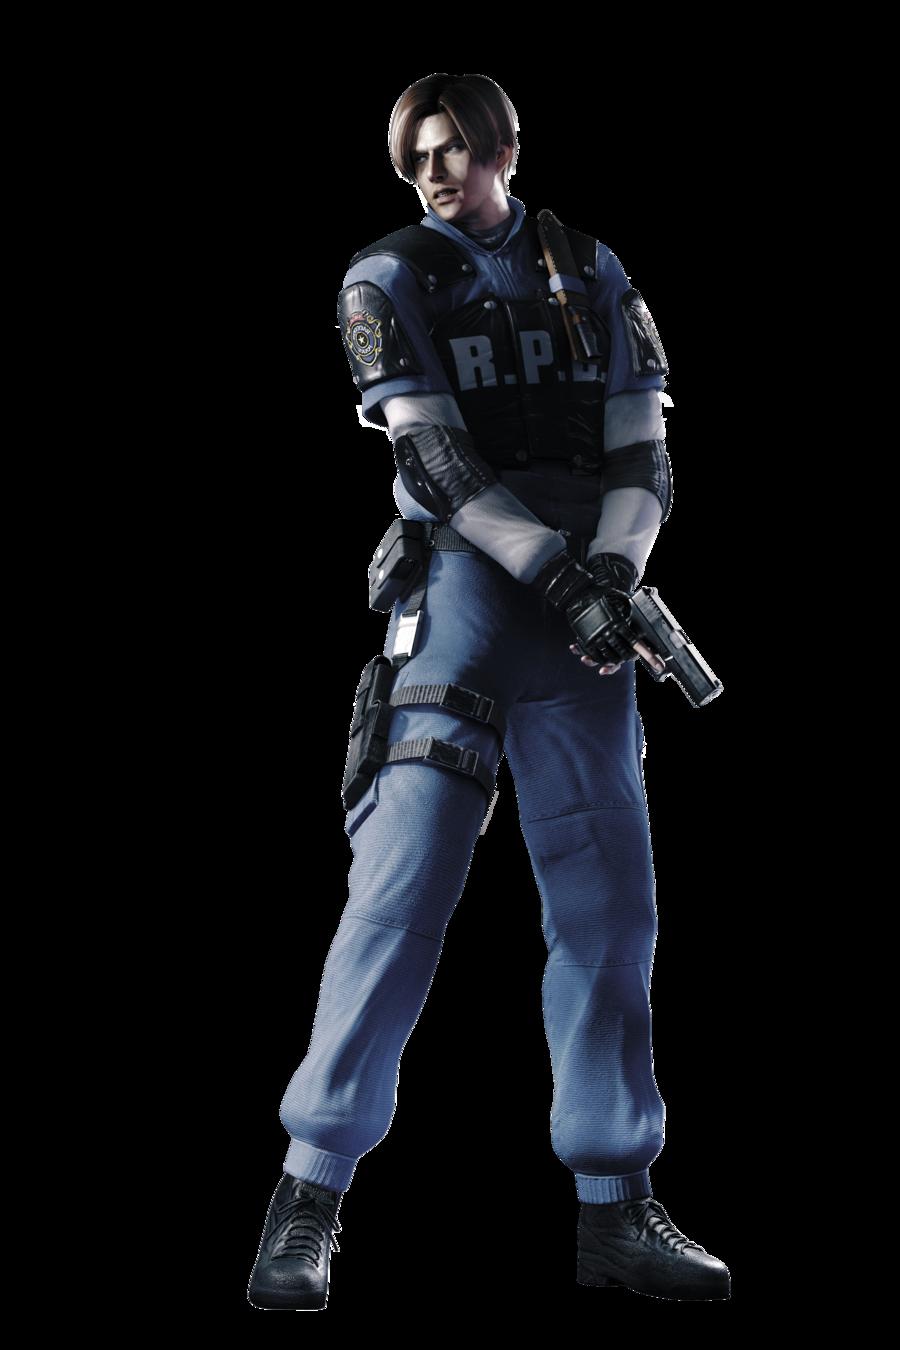 Pin By Guiltyghoul23 David23red On Male Apocalypse Survivors Art Resident Evil Leon Resident Evil Resident Evil Game